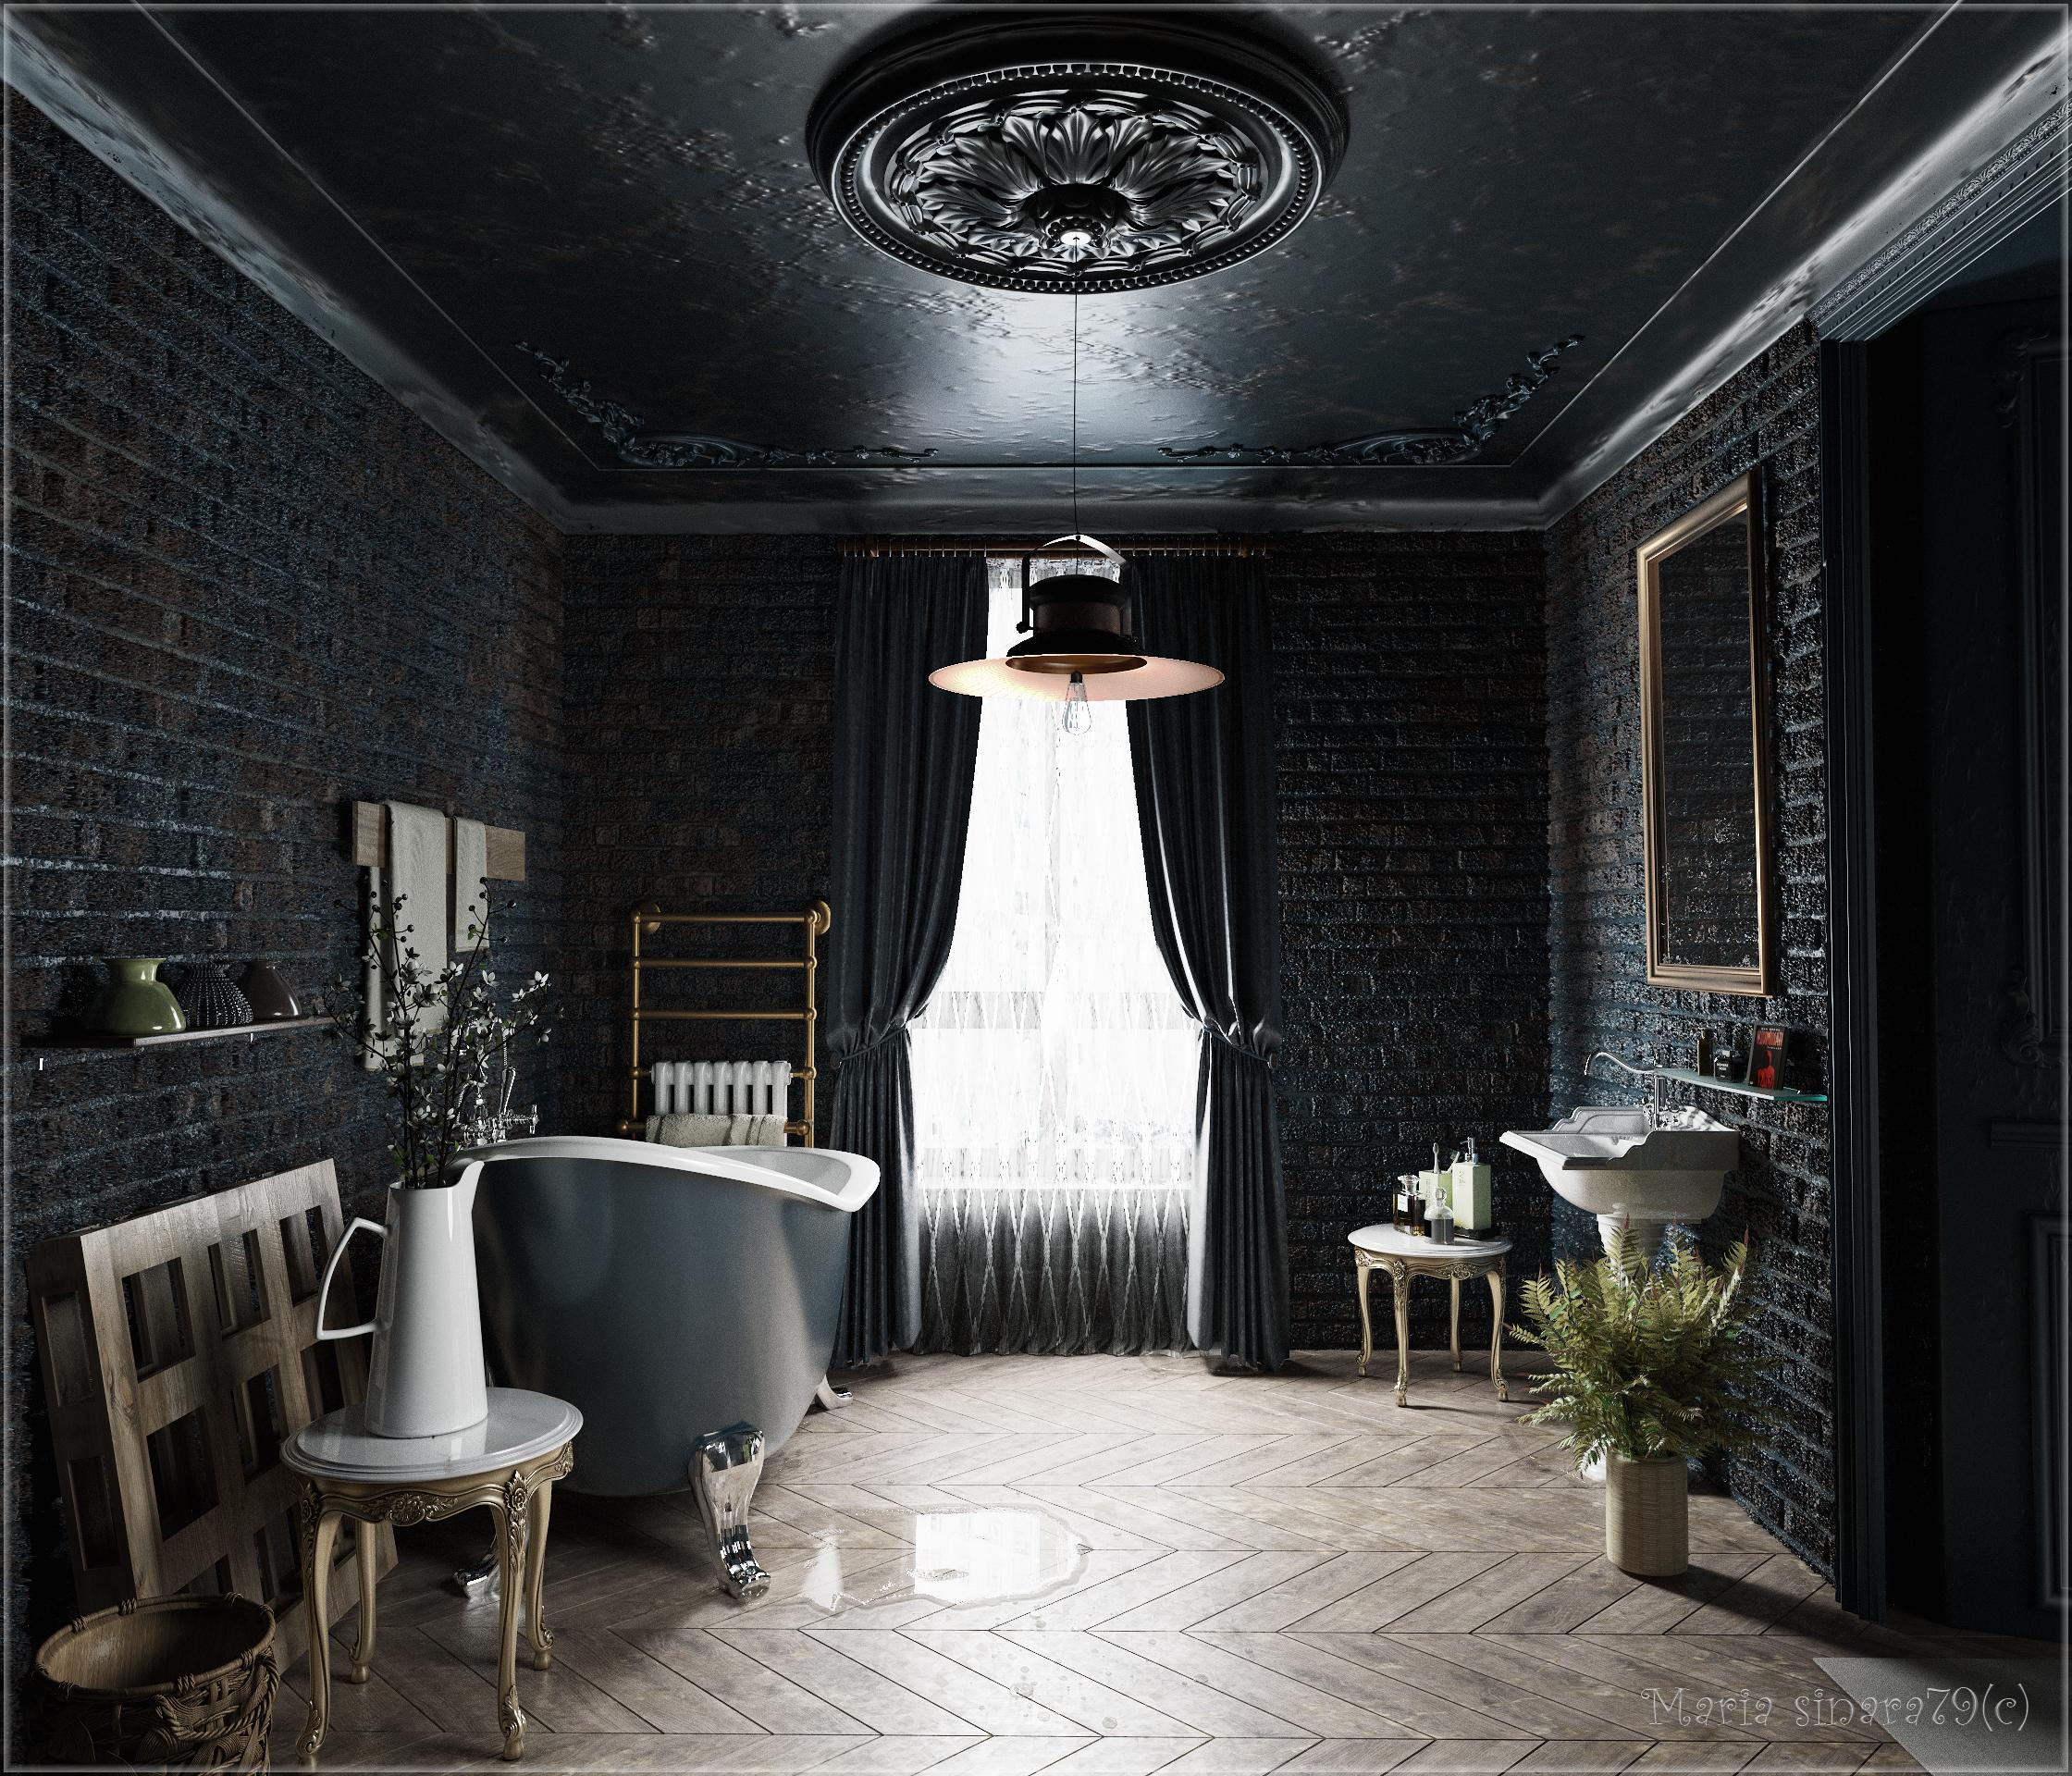 Bathroom in 3d max corona render image